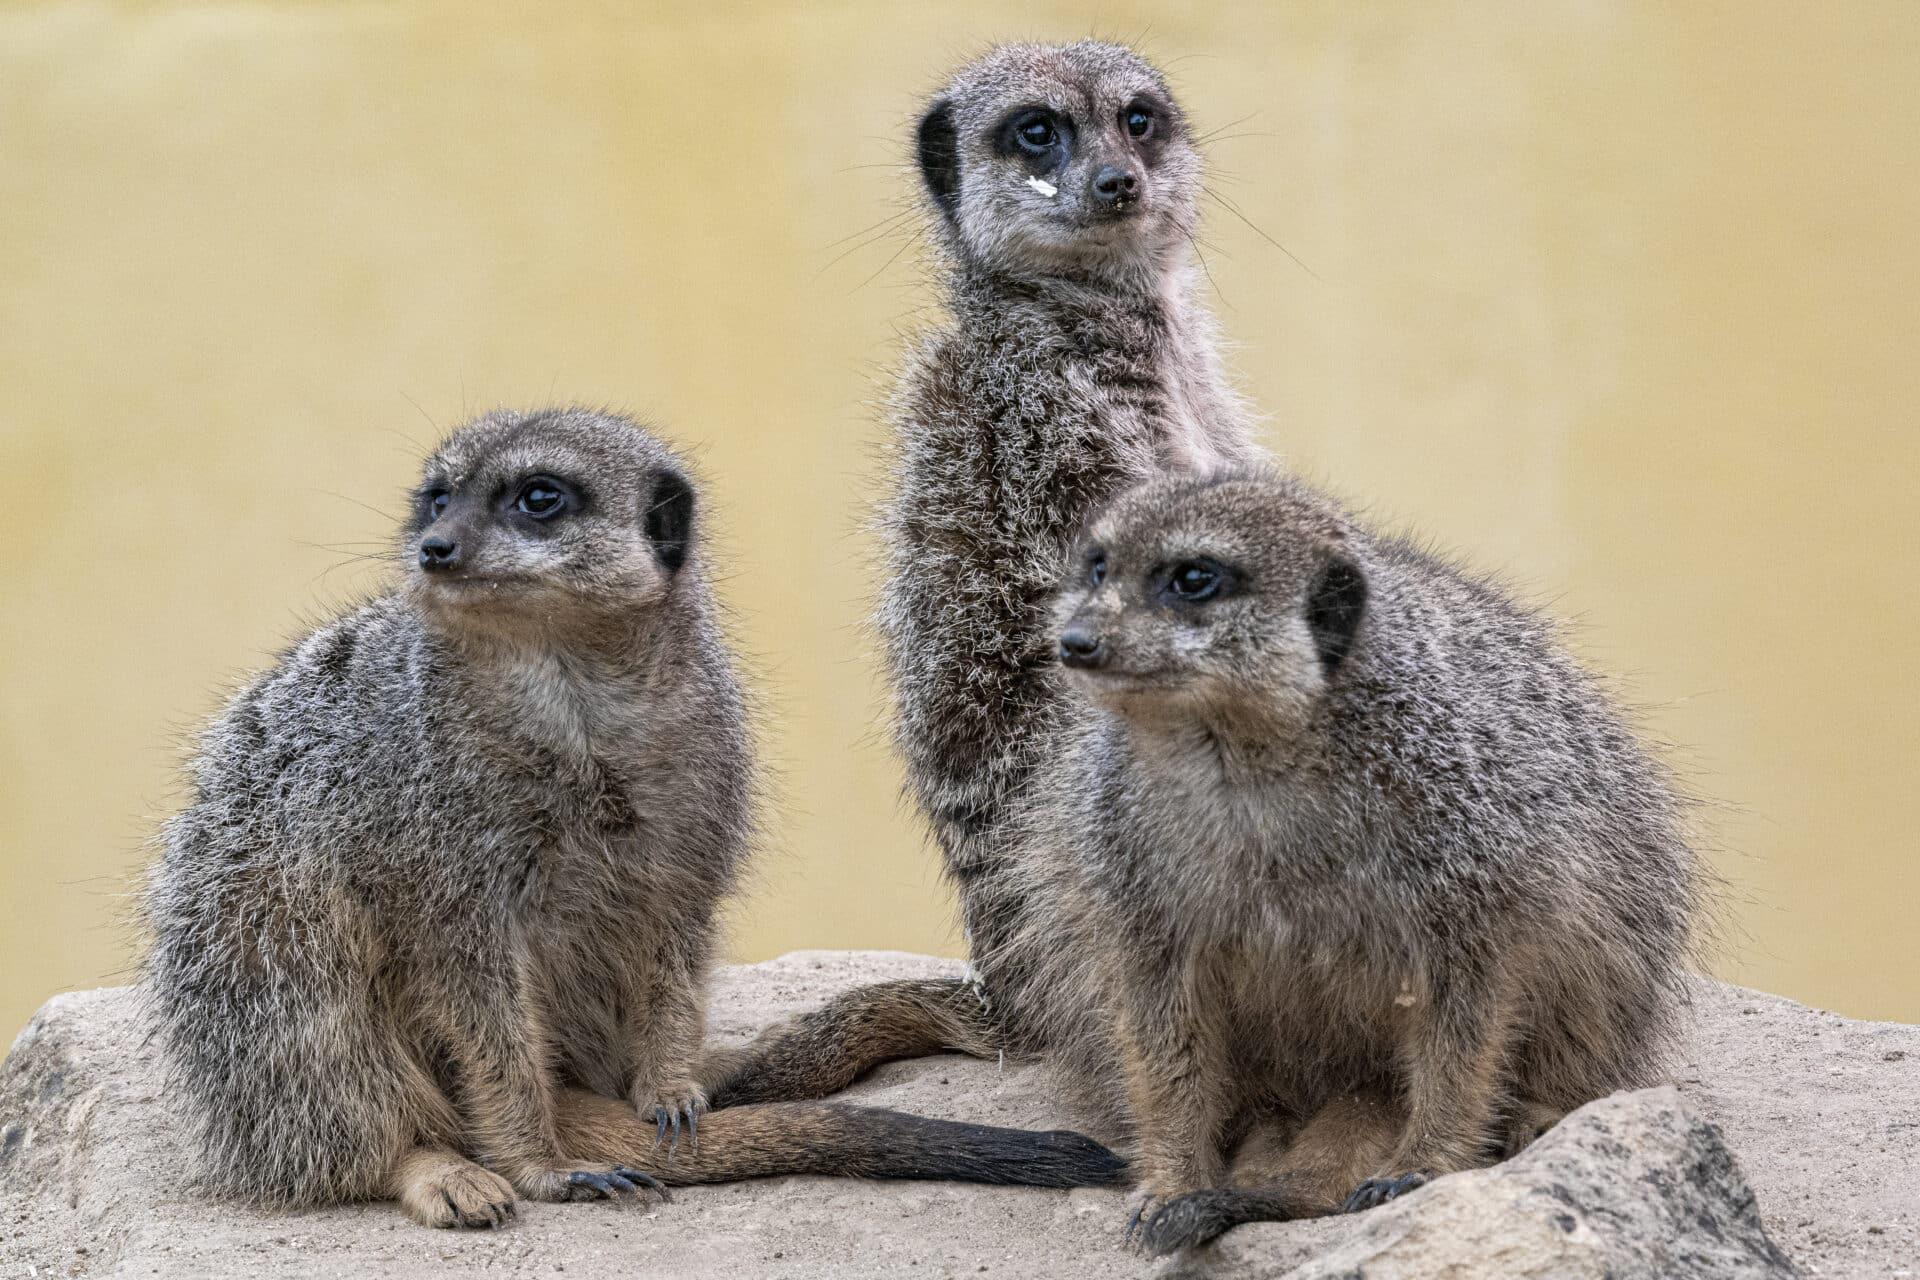 Meerkat Suricata Suricatta Marwell Zoo Jason Brown Meerkats 9